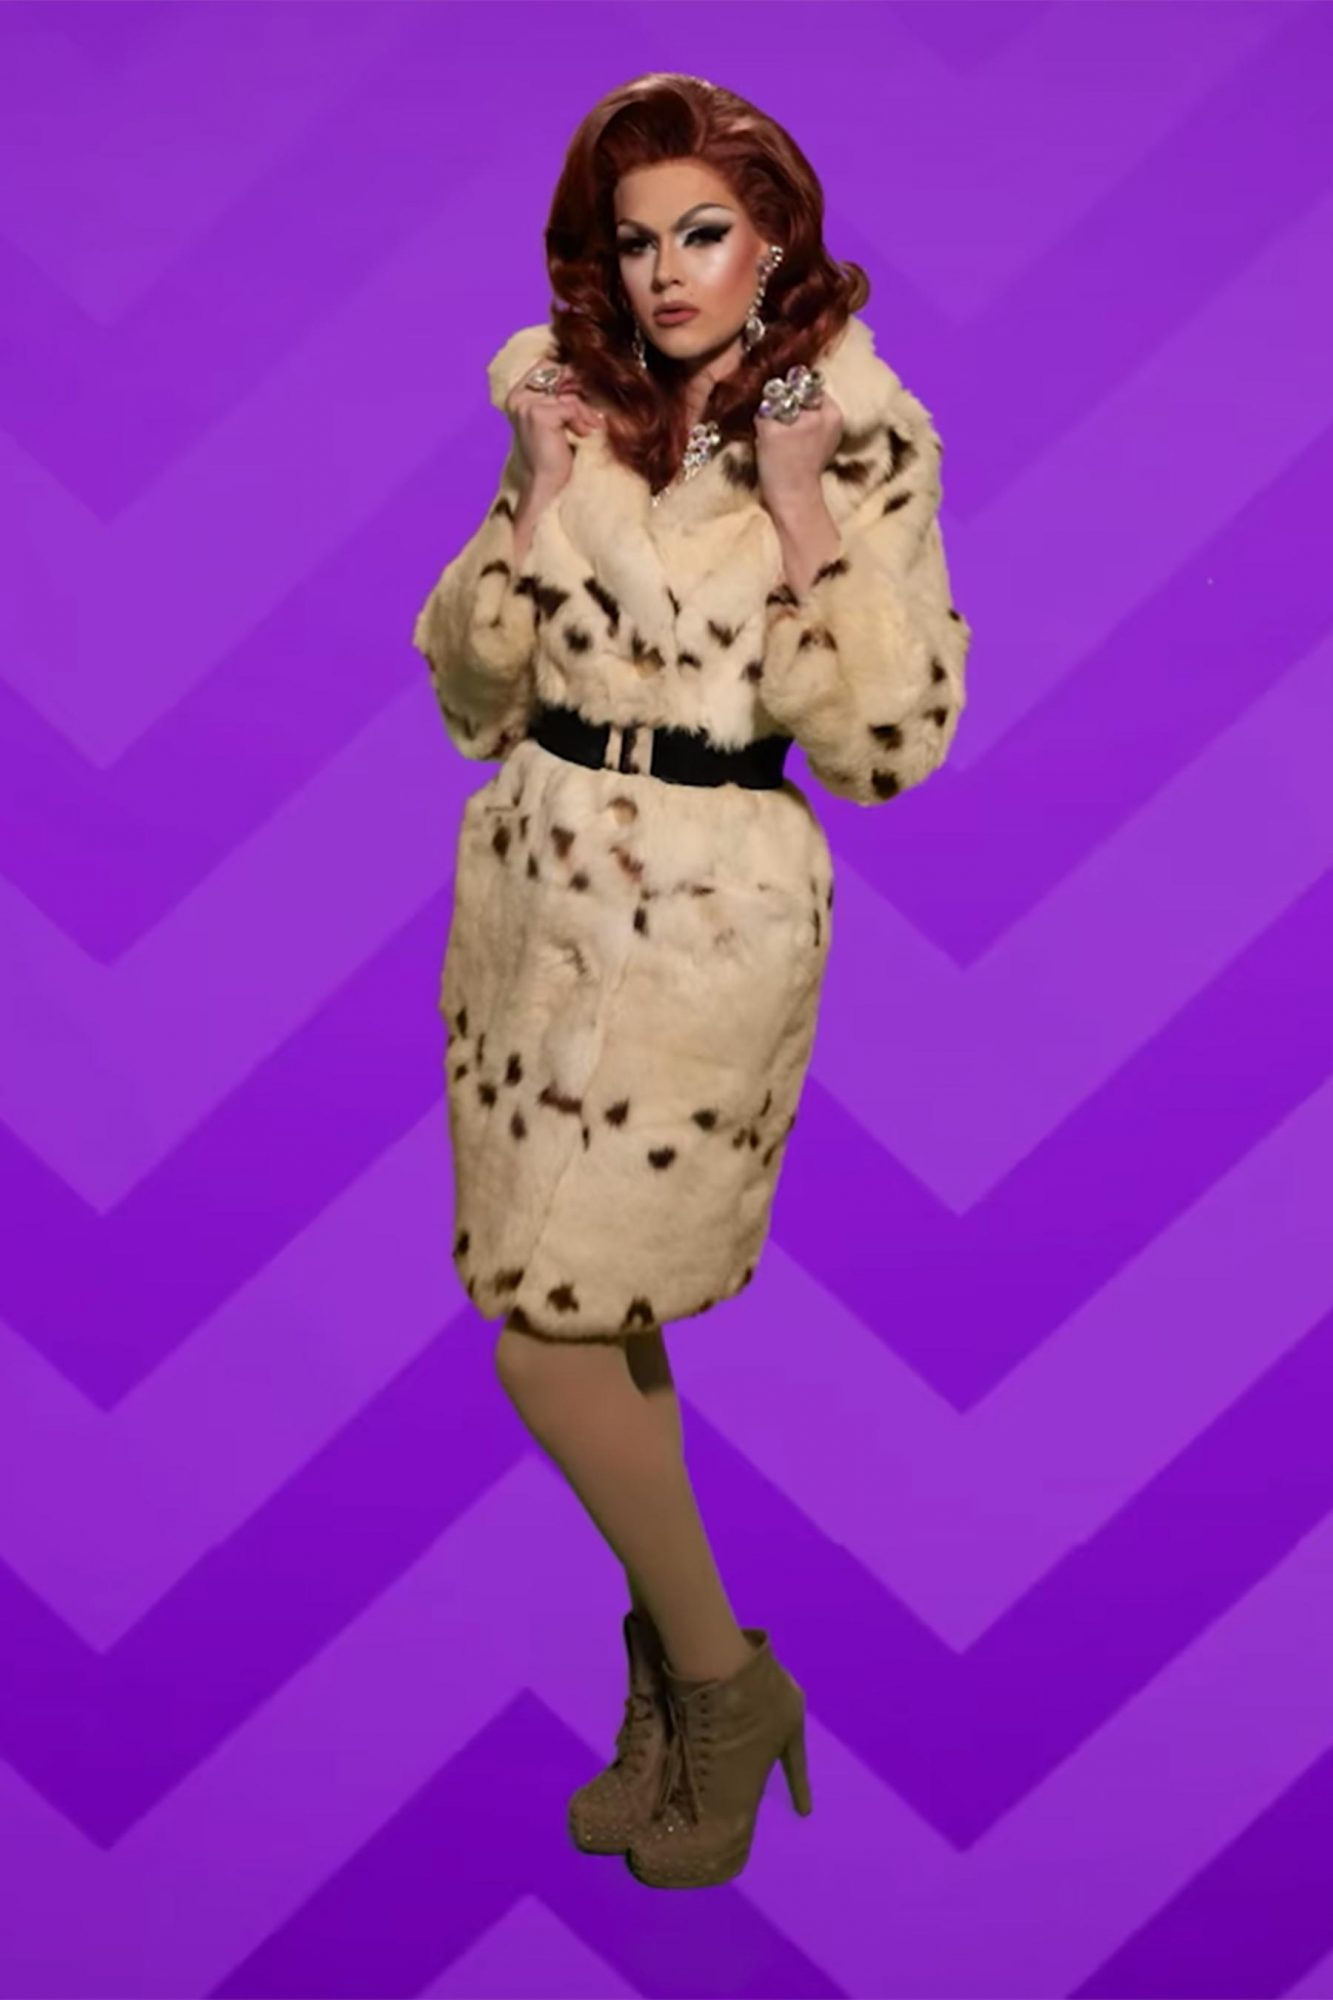 RuPaul's Drag Race season 10 Runway LooksCredit: VH1